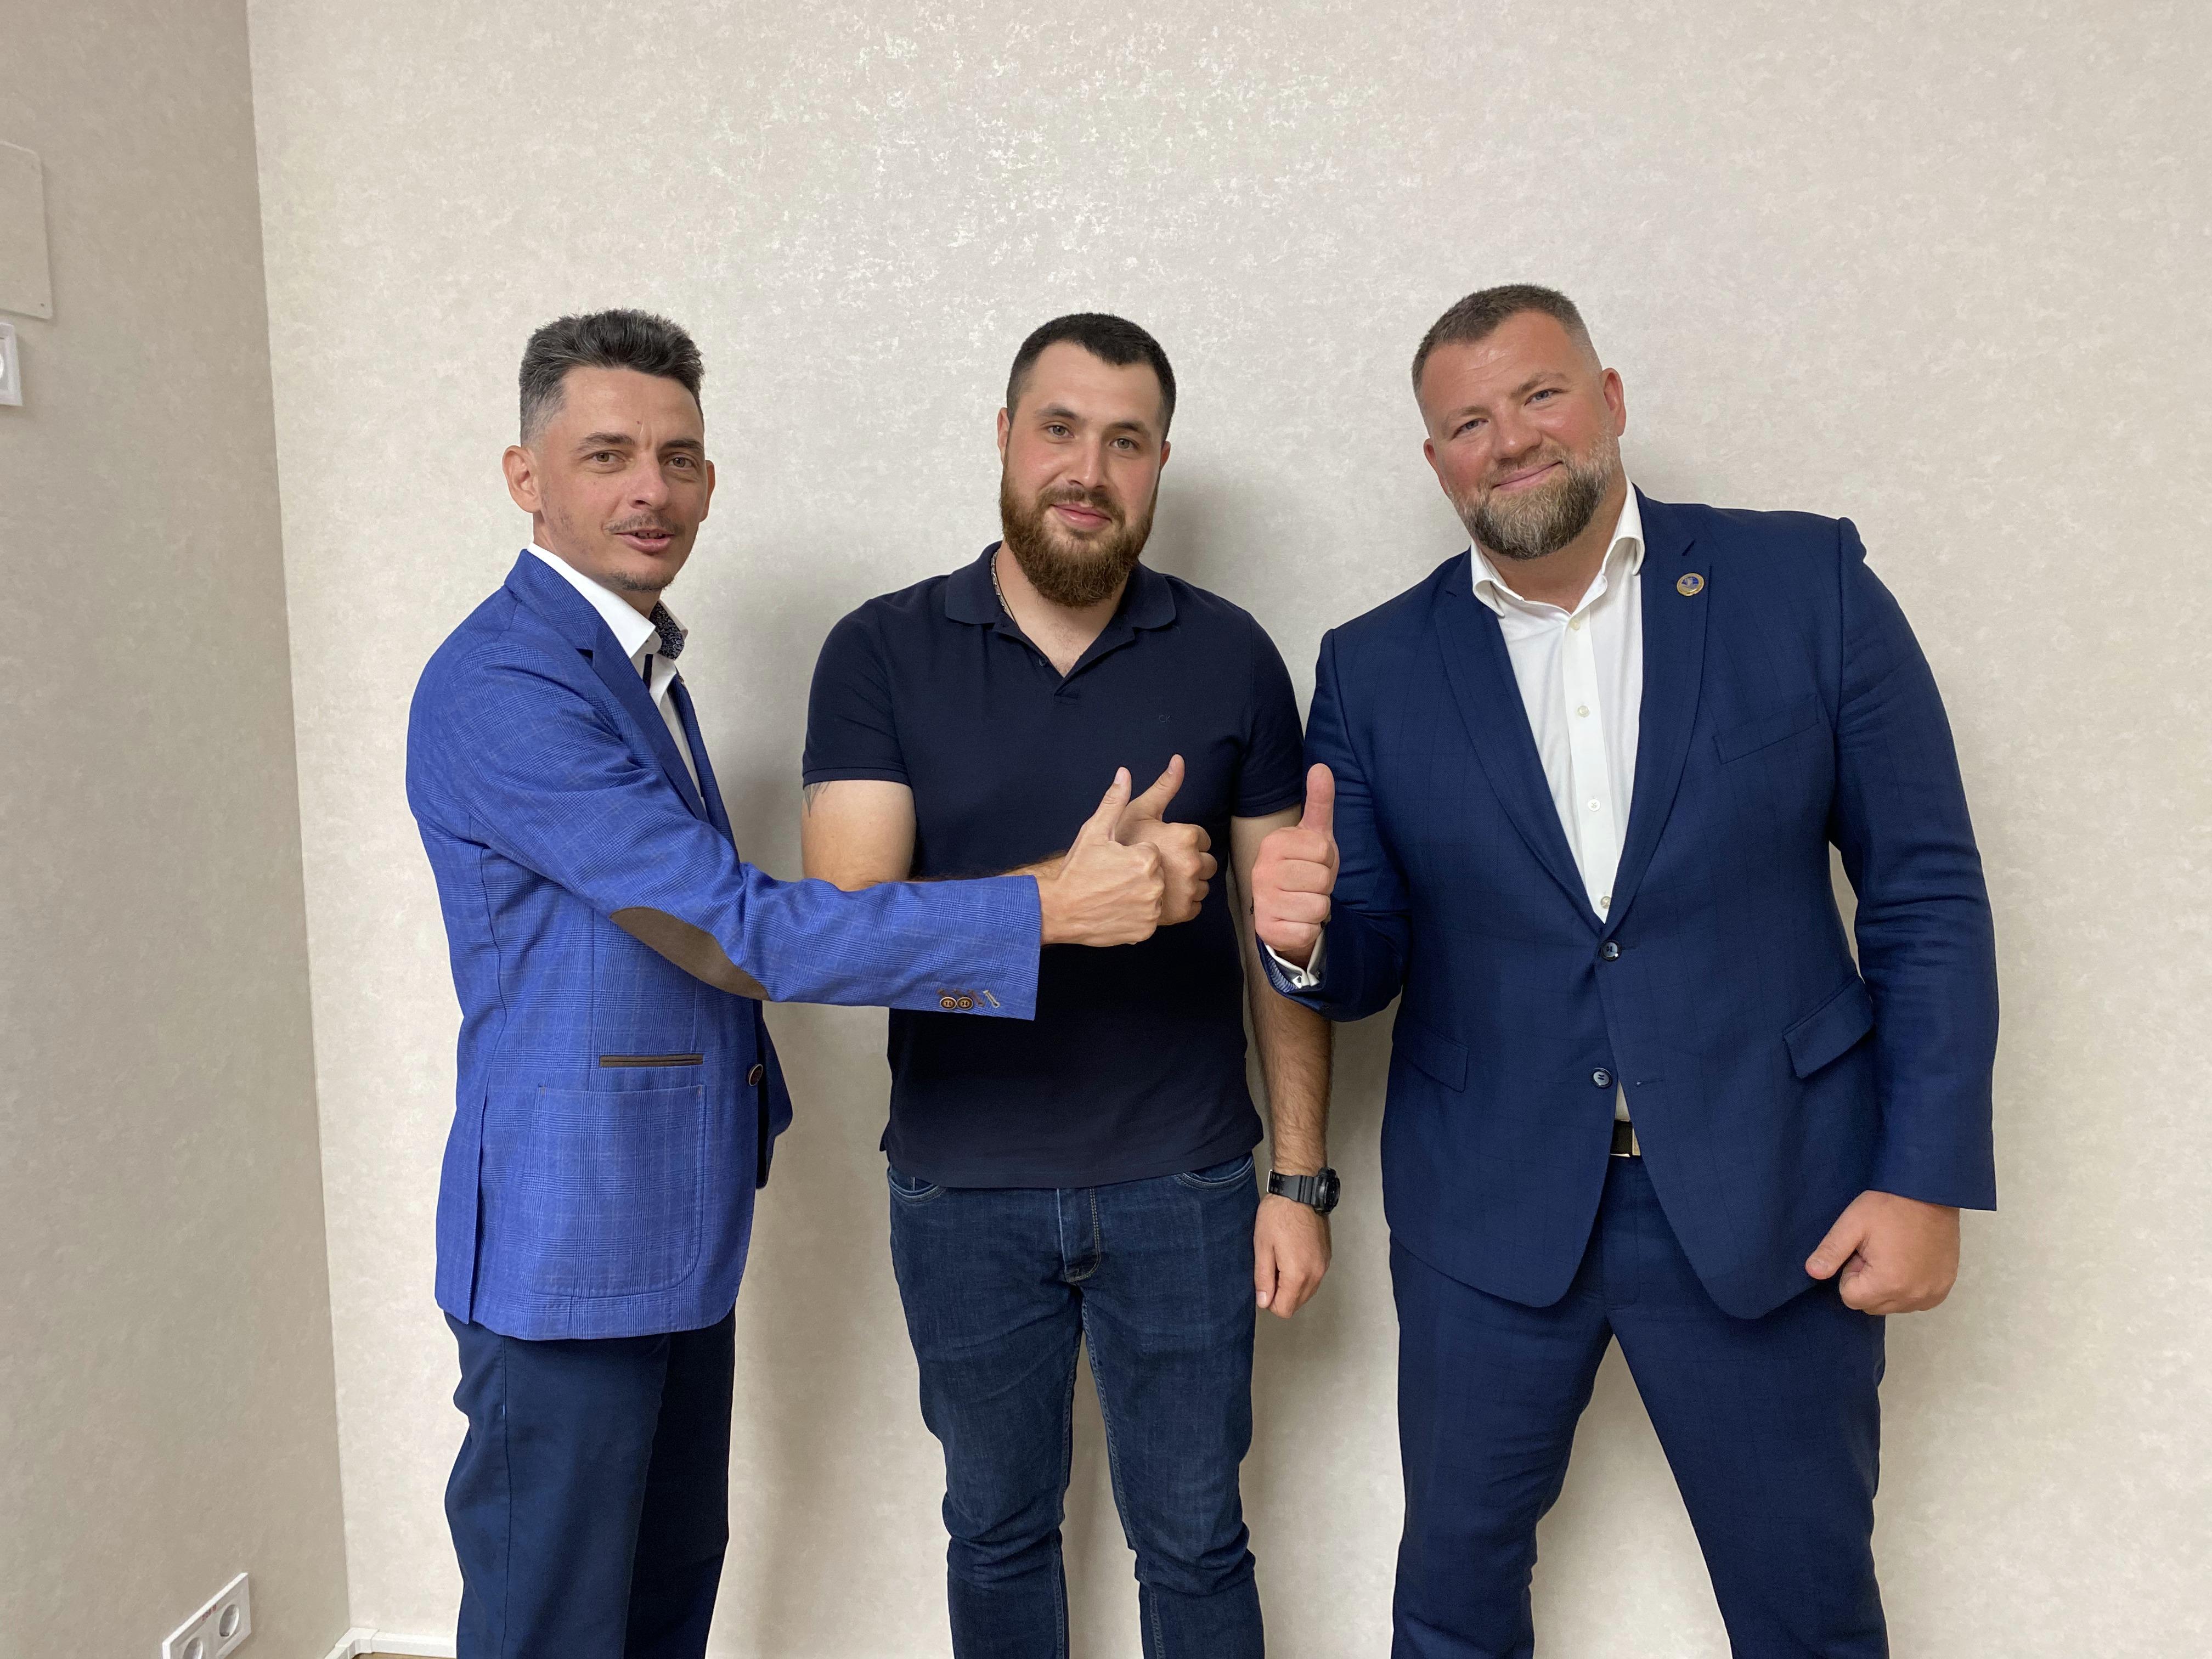 Yevgeniy Nikolov, Yuriy Sergieiev, MTWTU legal advisor, and Oleg Grygoriuk MTWTU Chairman